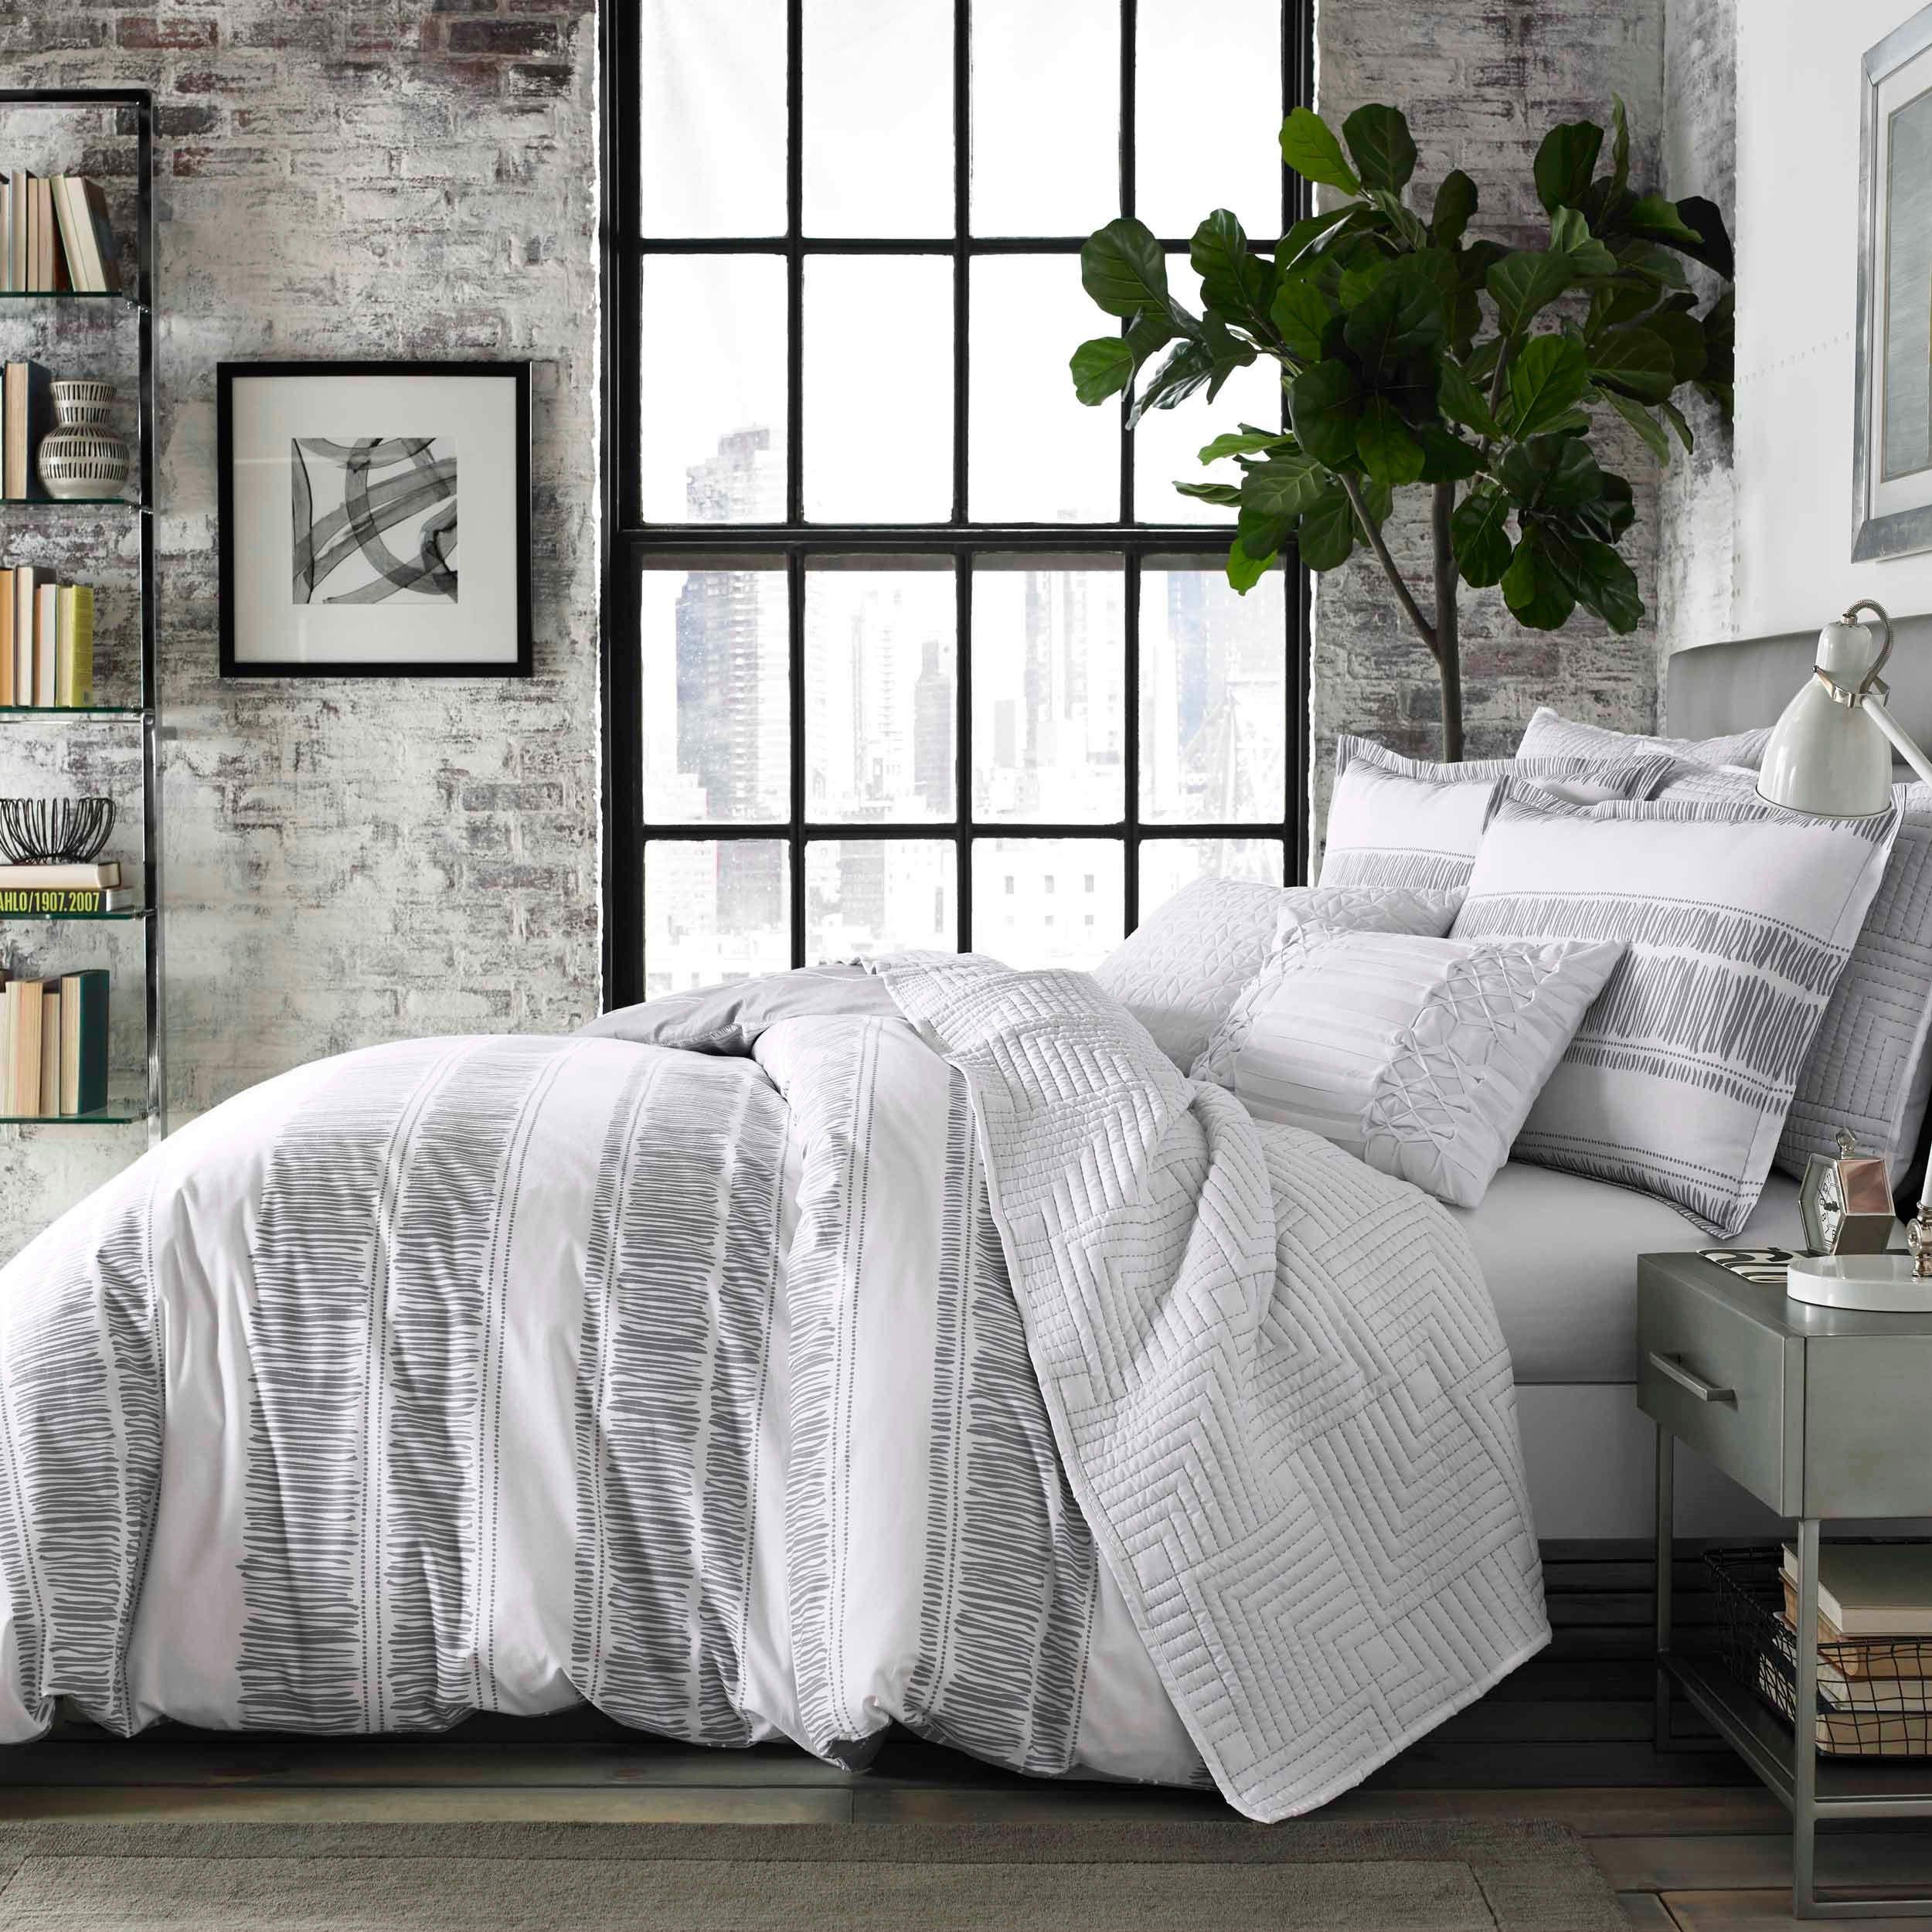 Home in 2019 Comforter sets, Comforters, Duvet cover sets